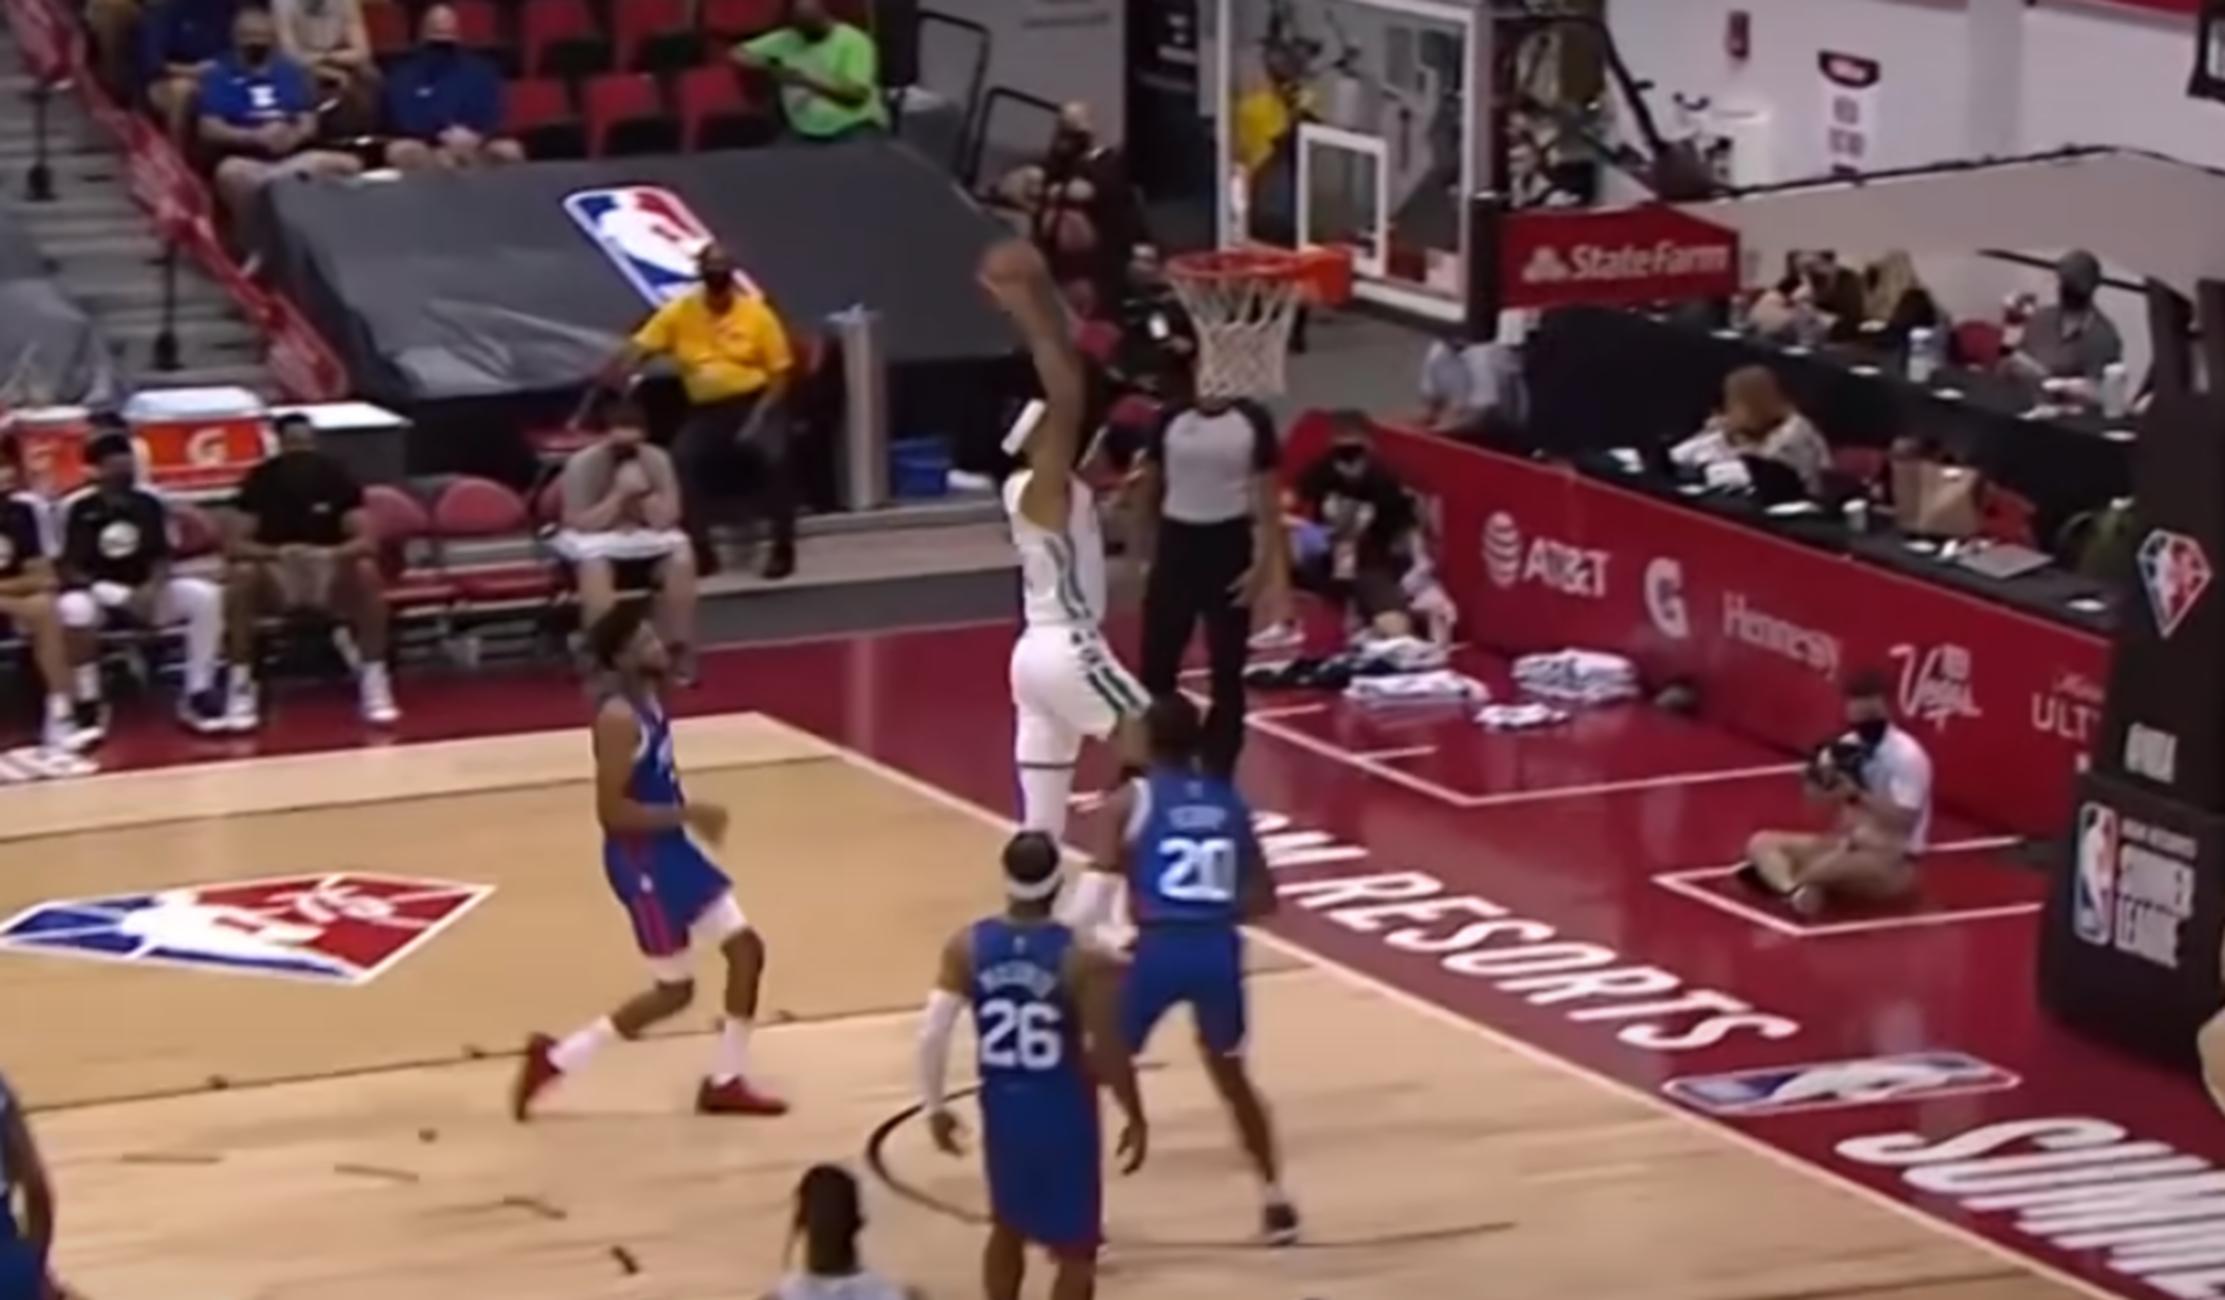 NBA Summer League: Φοβερή εμφάνιση από τον Όγκαστ με τους Σέλτικς